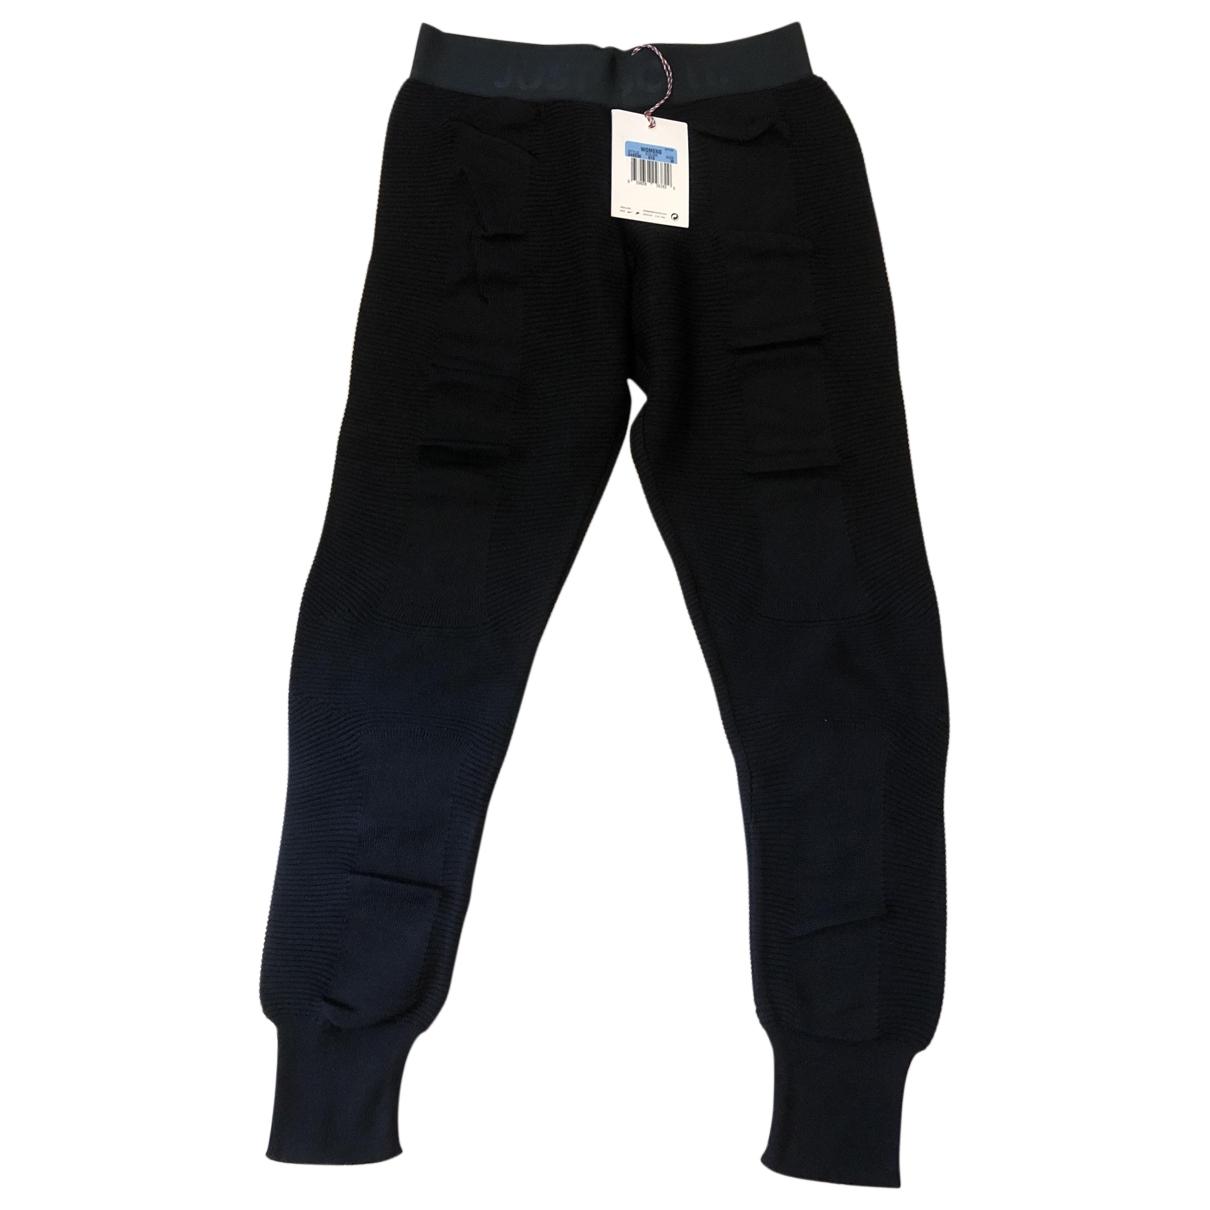 Nike \N Black Cotton Trousers for Women M International